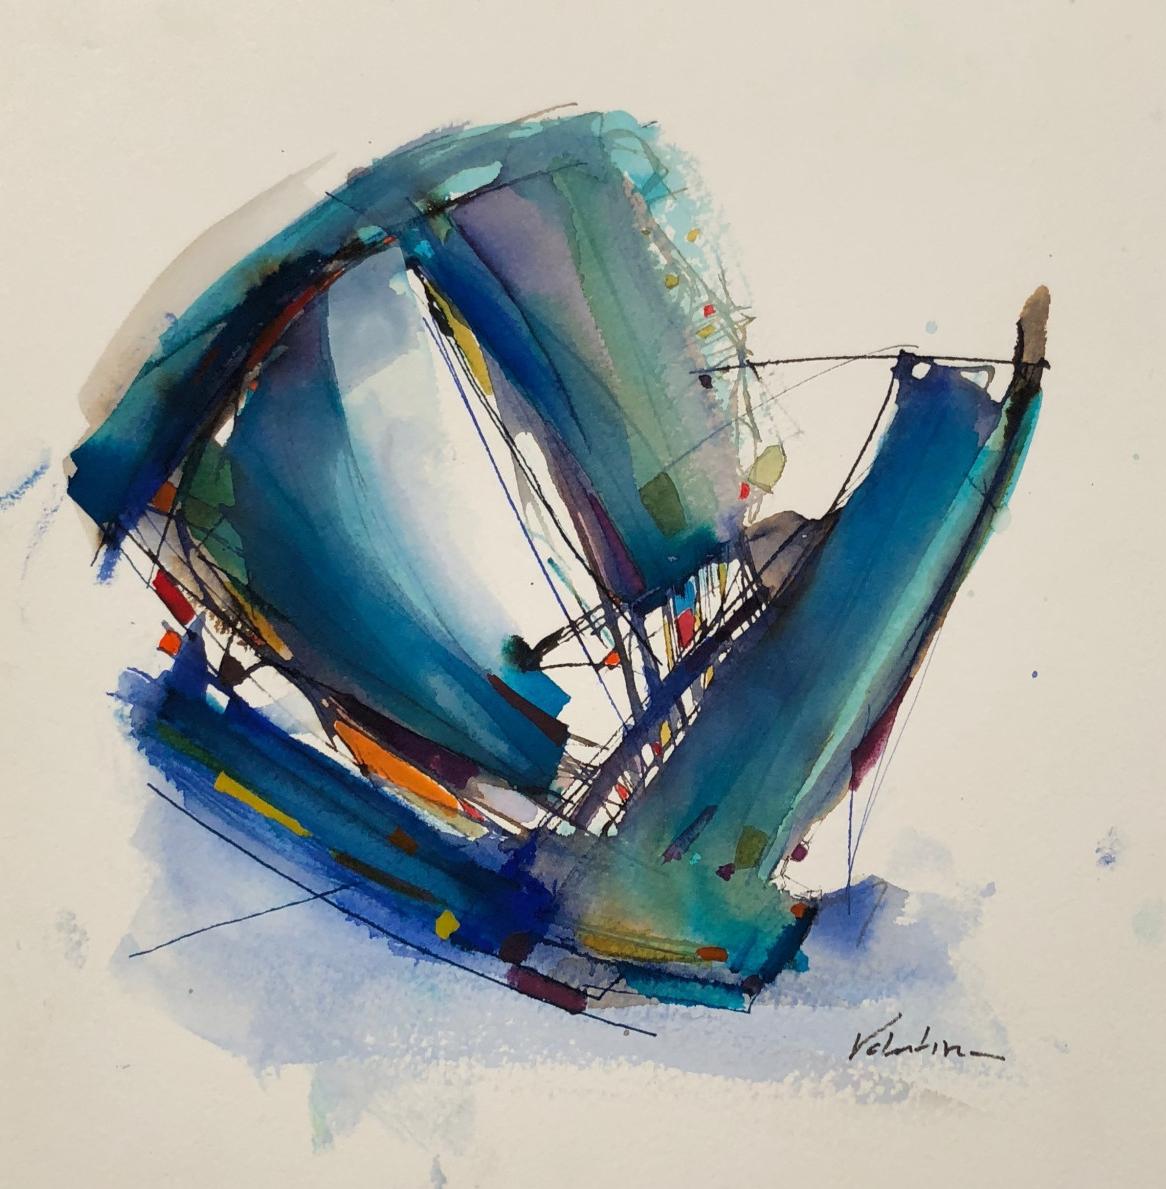 Valentina Atkinson, Sailing, 2017, Watercolor and Ink, 14 x 14 in.